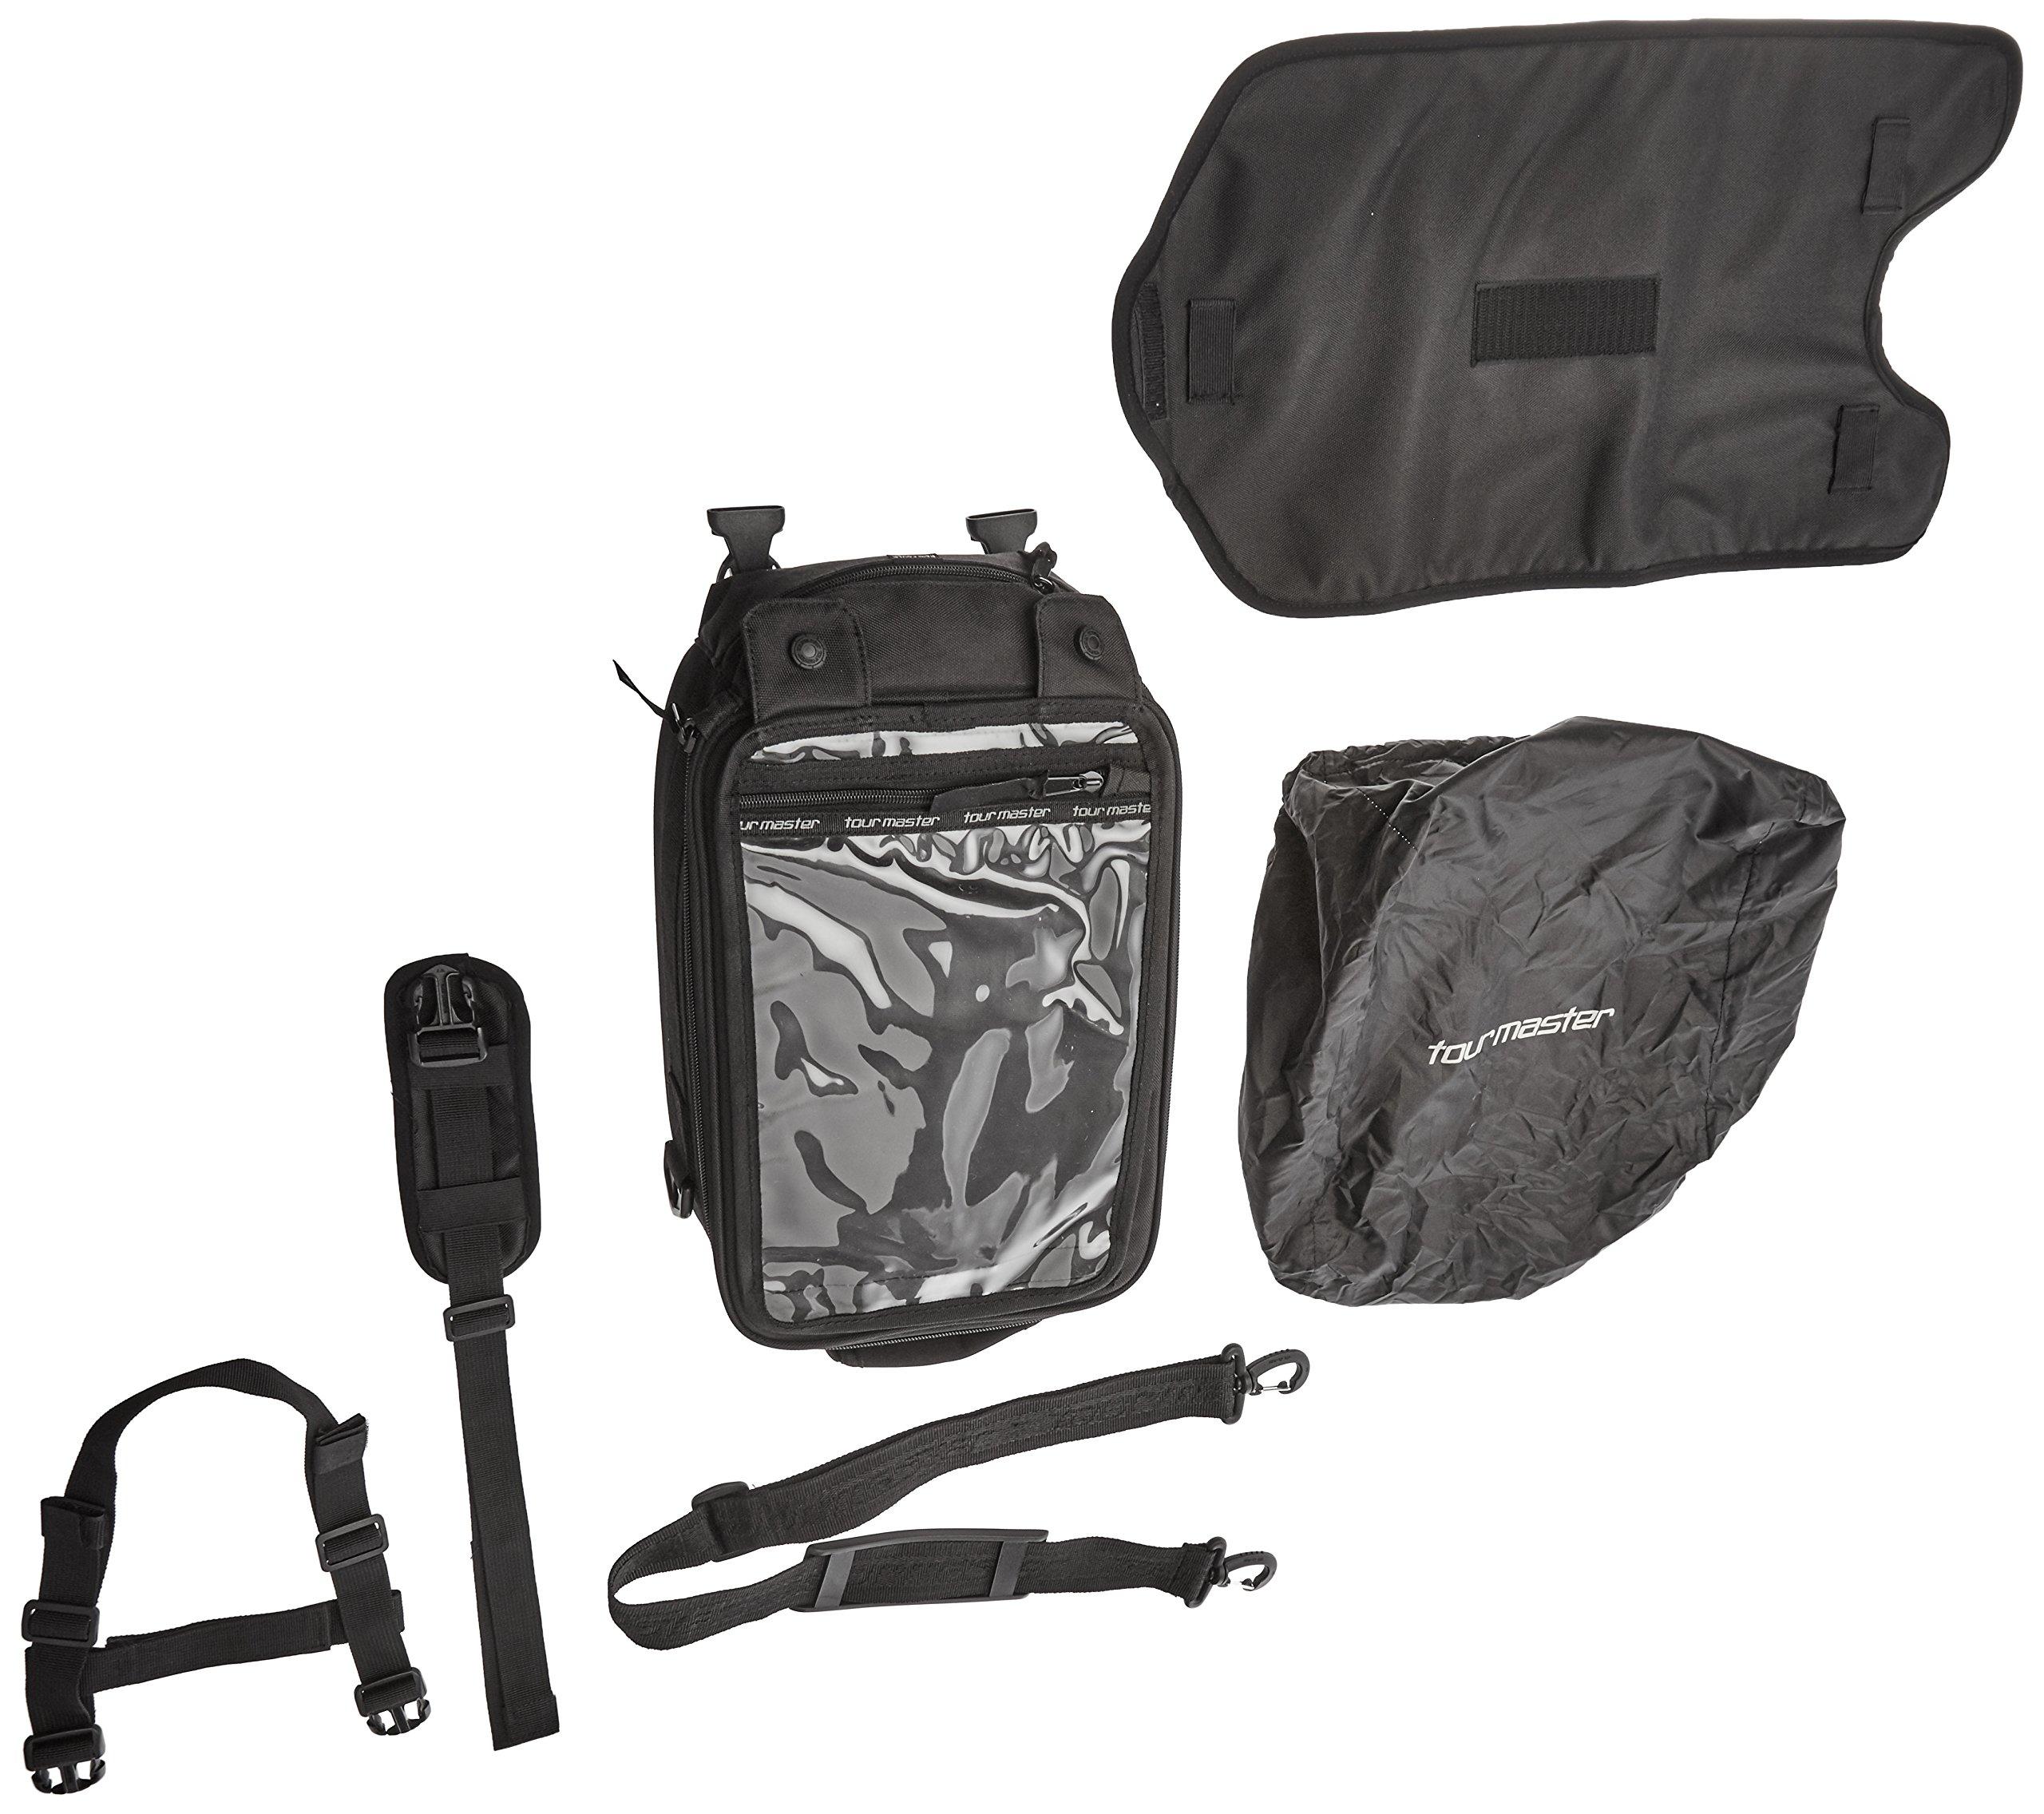 Tourmaster 8215-1305-04 Black Select Strap Mount Tank Bag